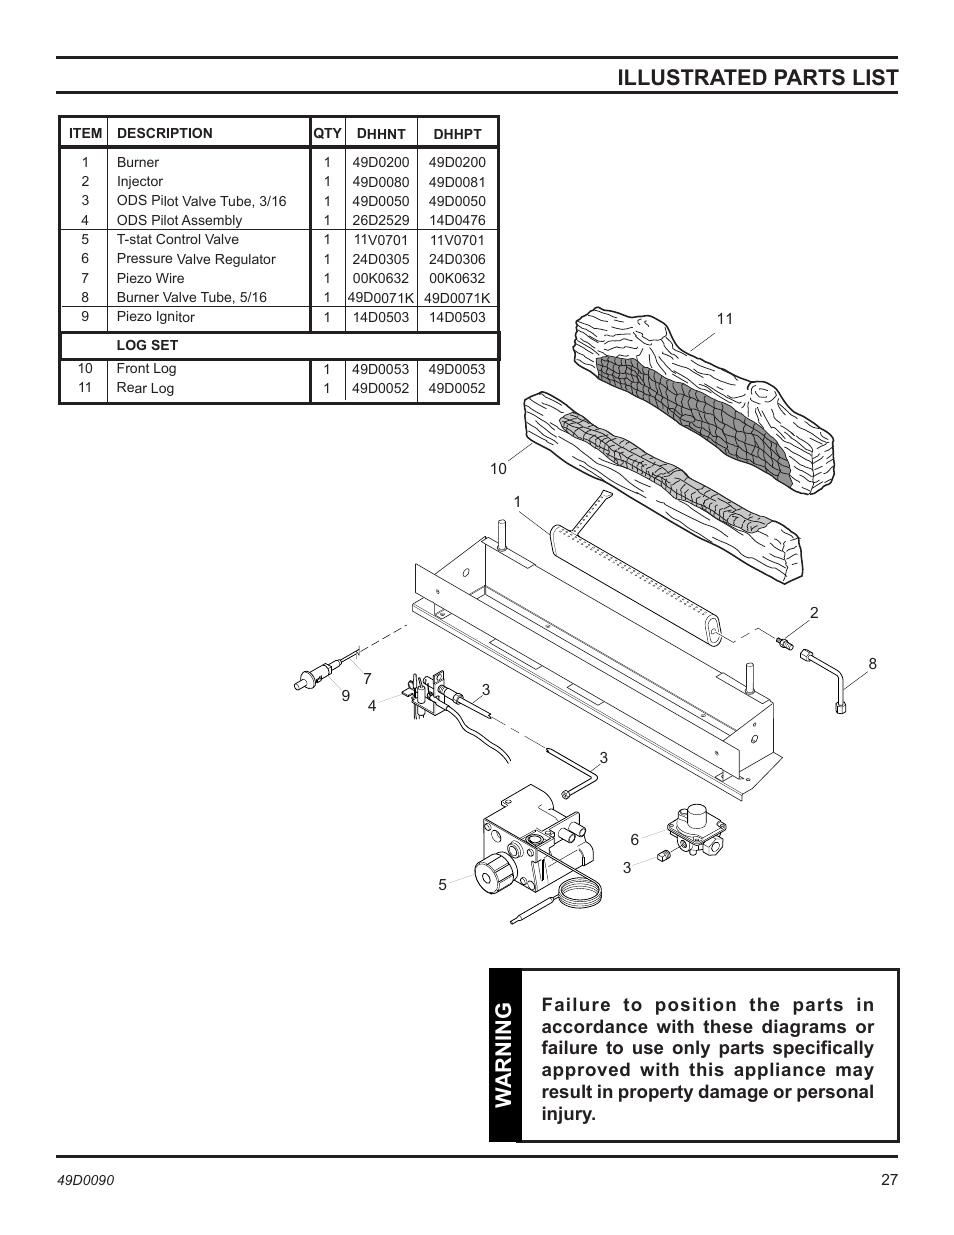 Illustrated Parts List Warning